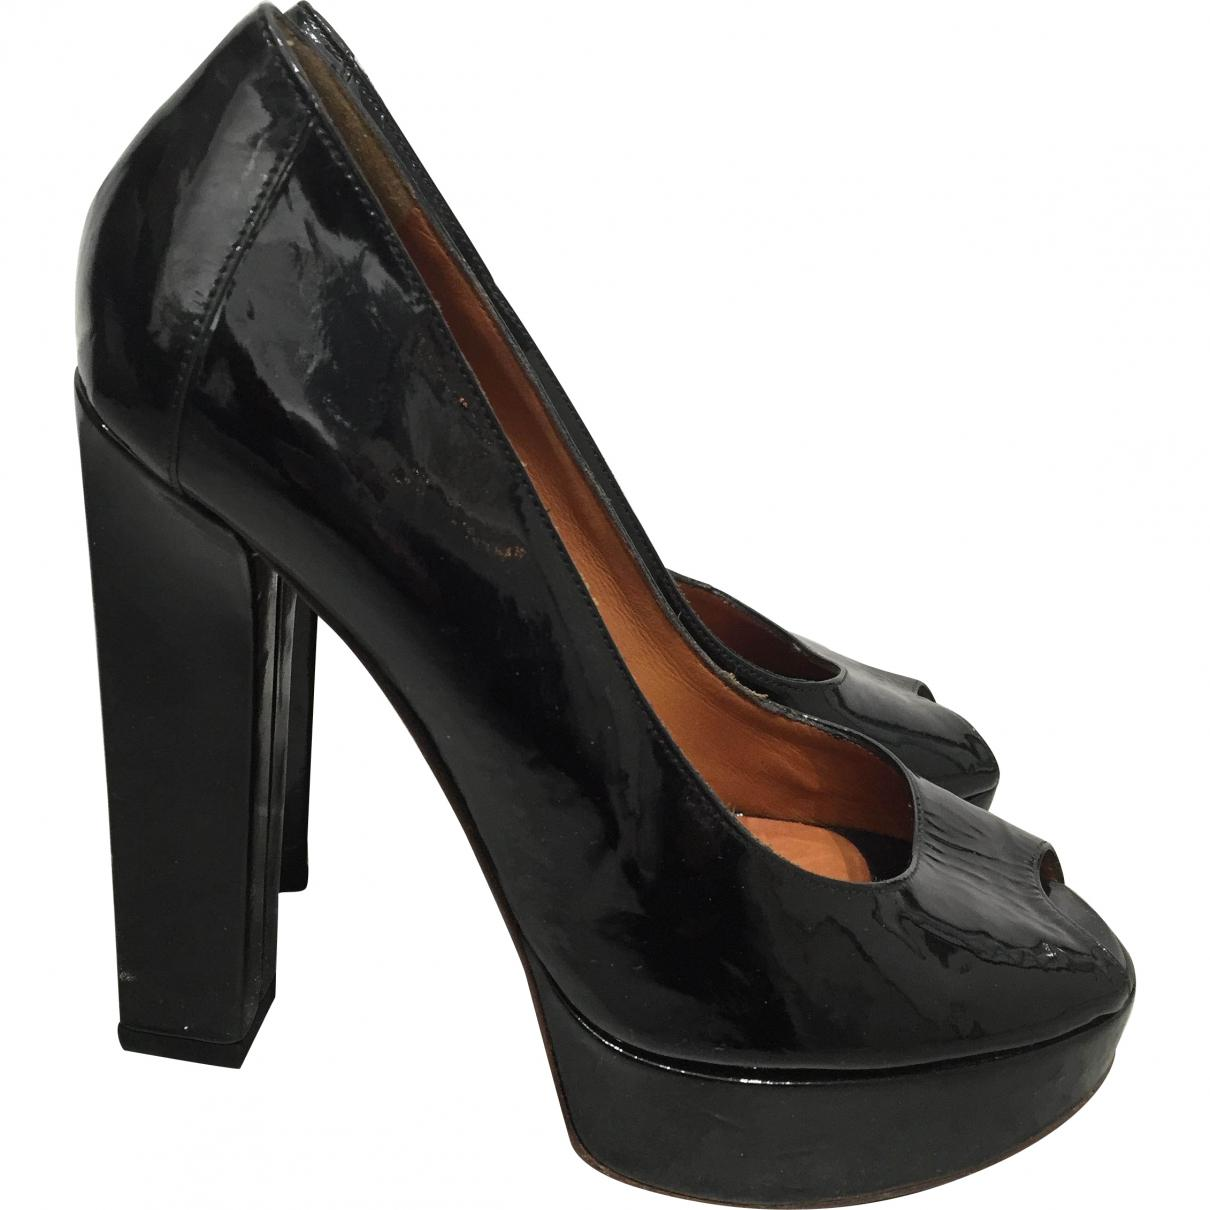 Pre-owned - Black Leather Heels Lanvin hTJ6eBRfX